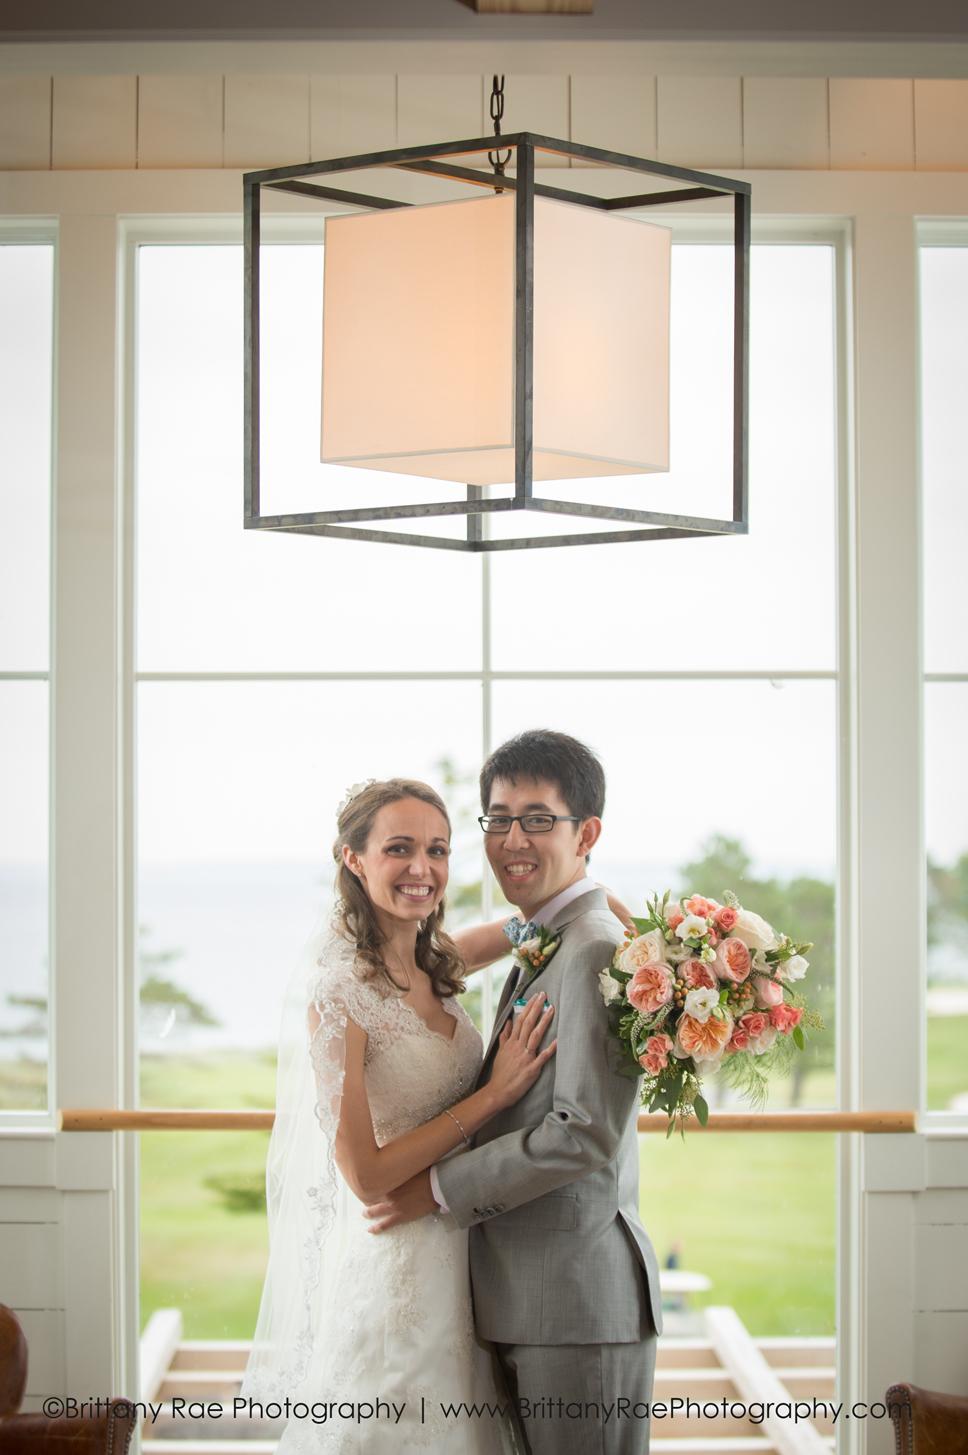 Samoset Resort Wedding Photos 1 - Couples portrait in the Lighthouse Room